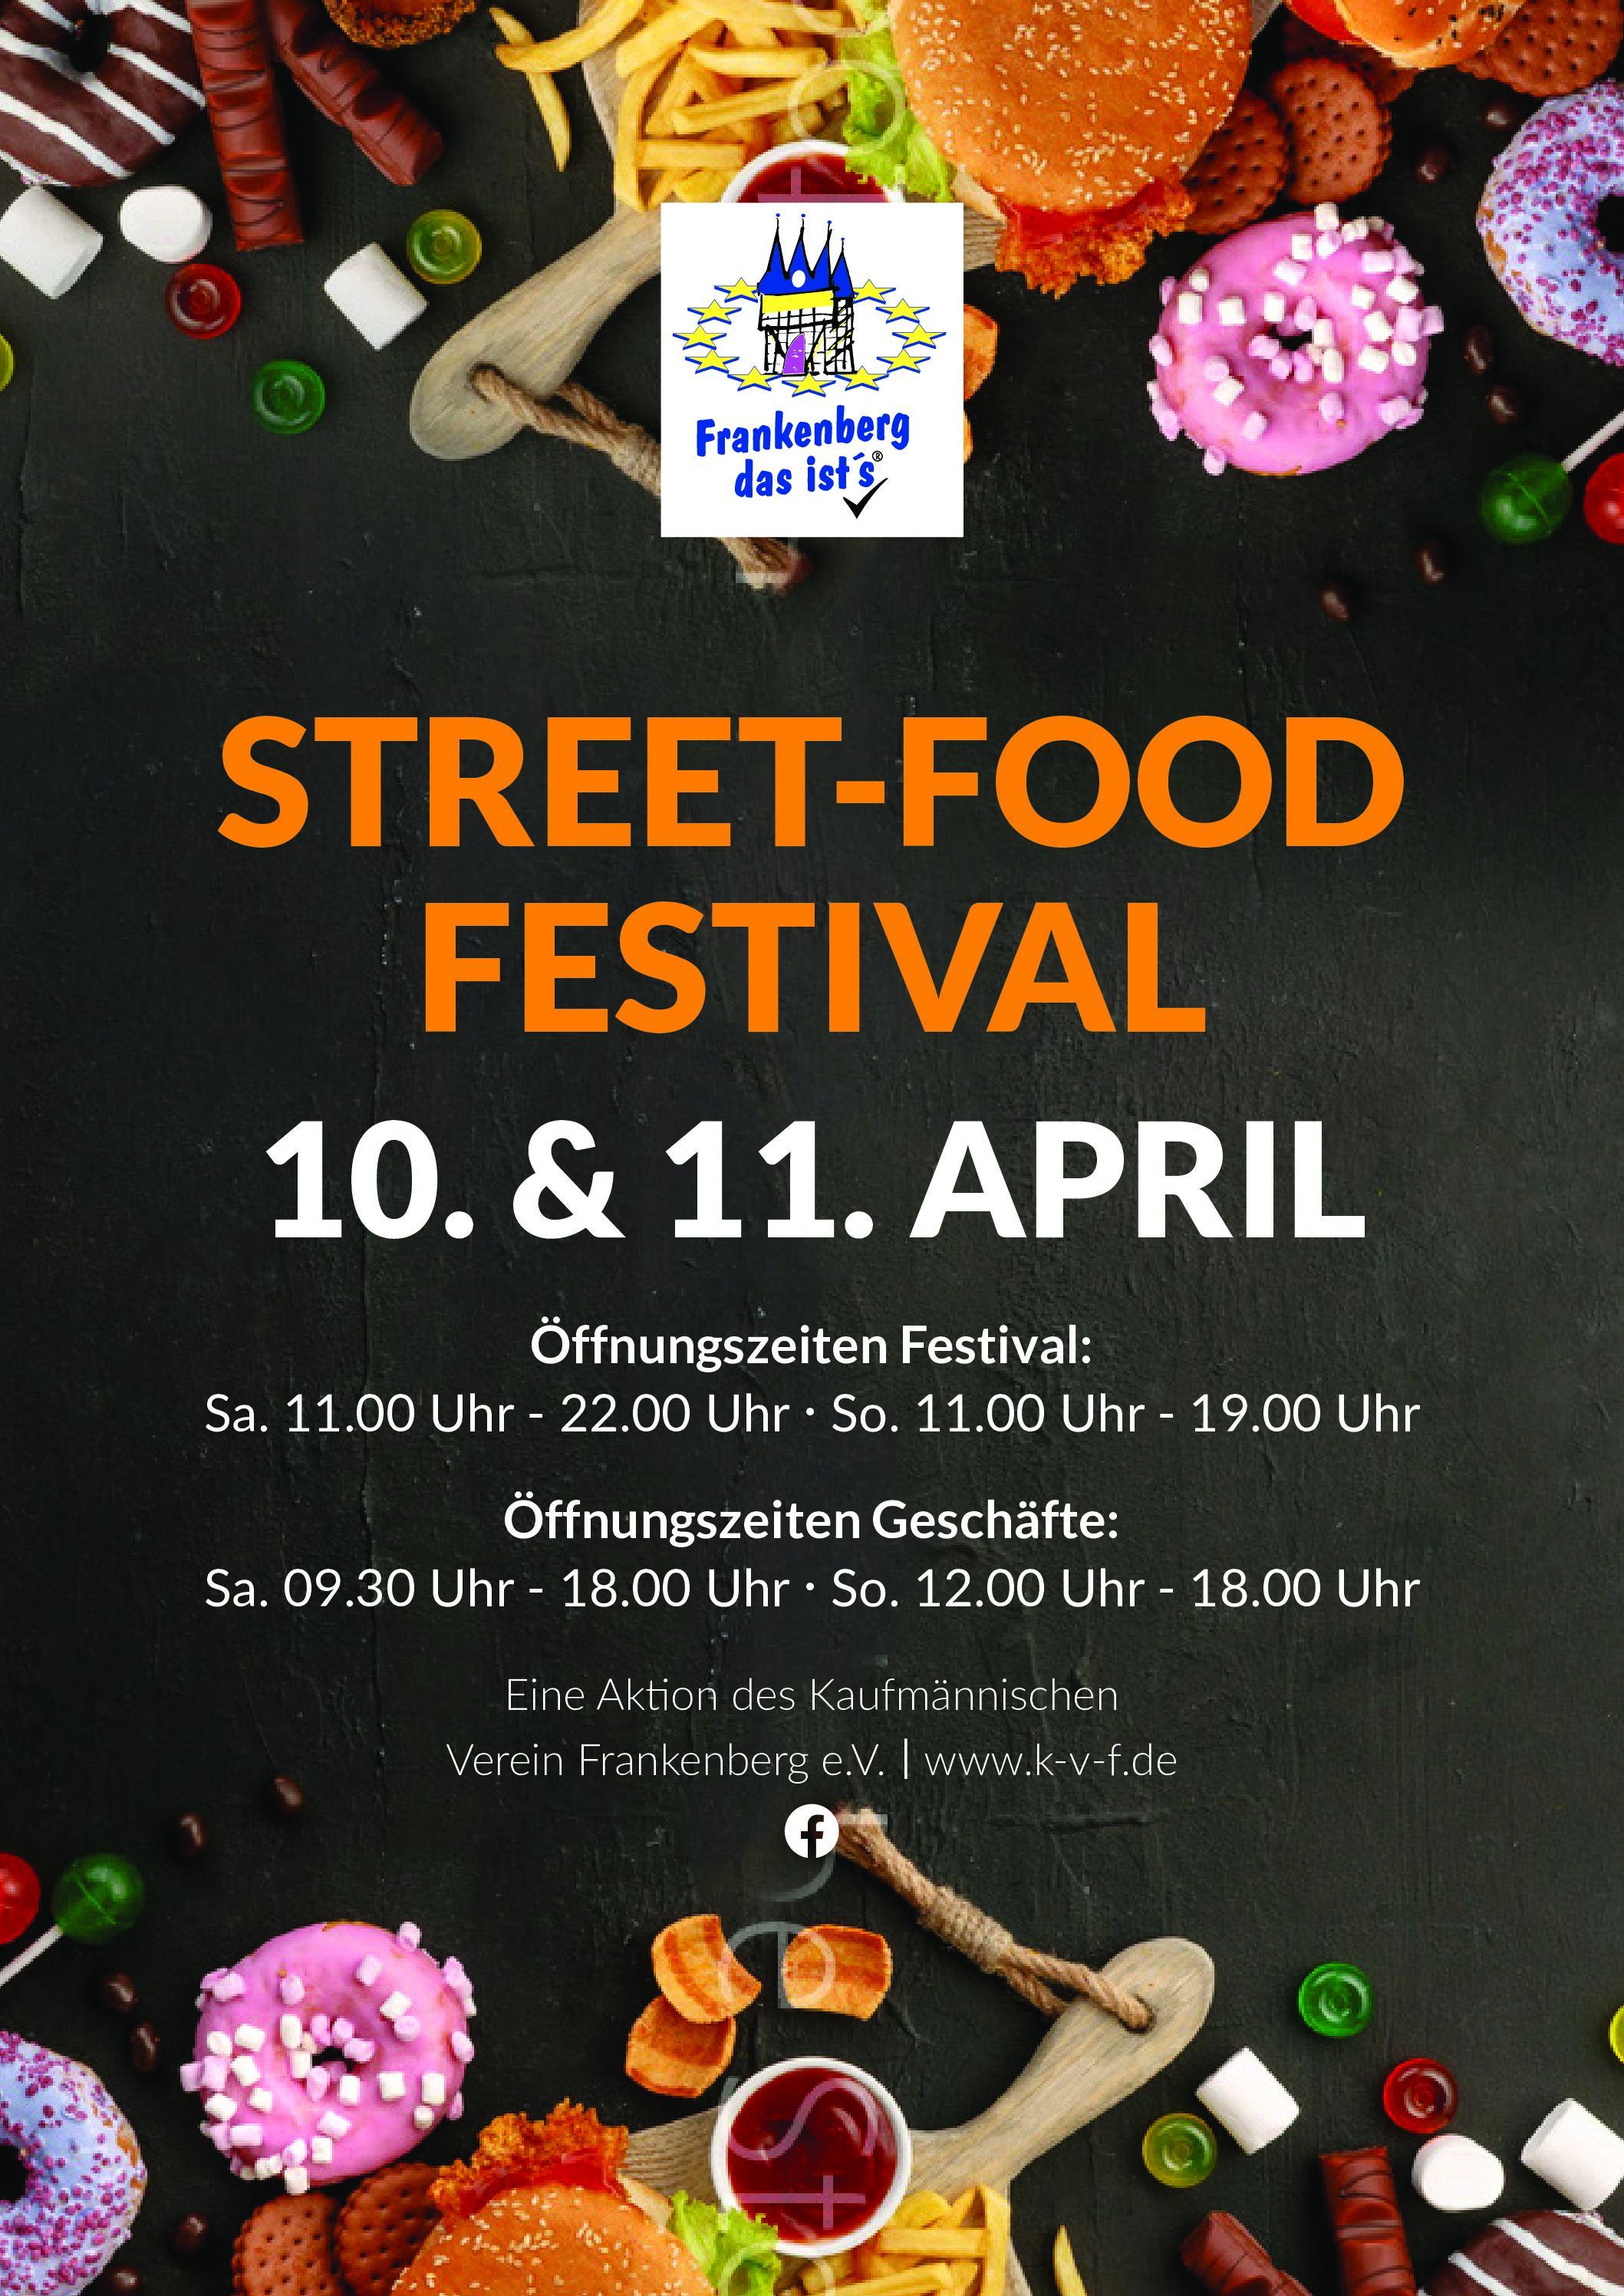 Streetfoodfestival 2021